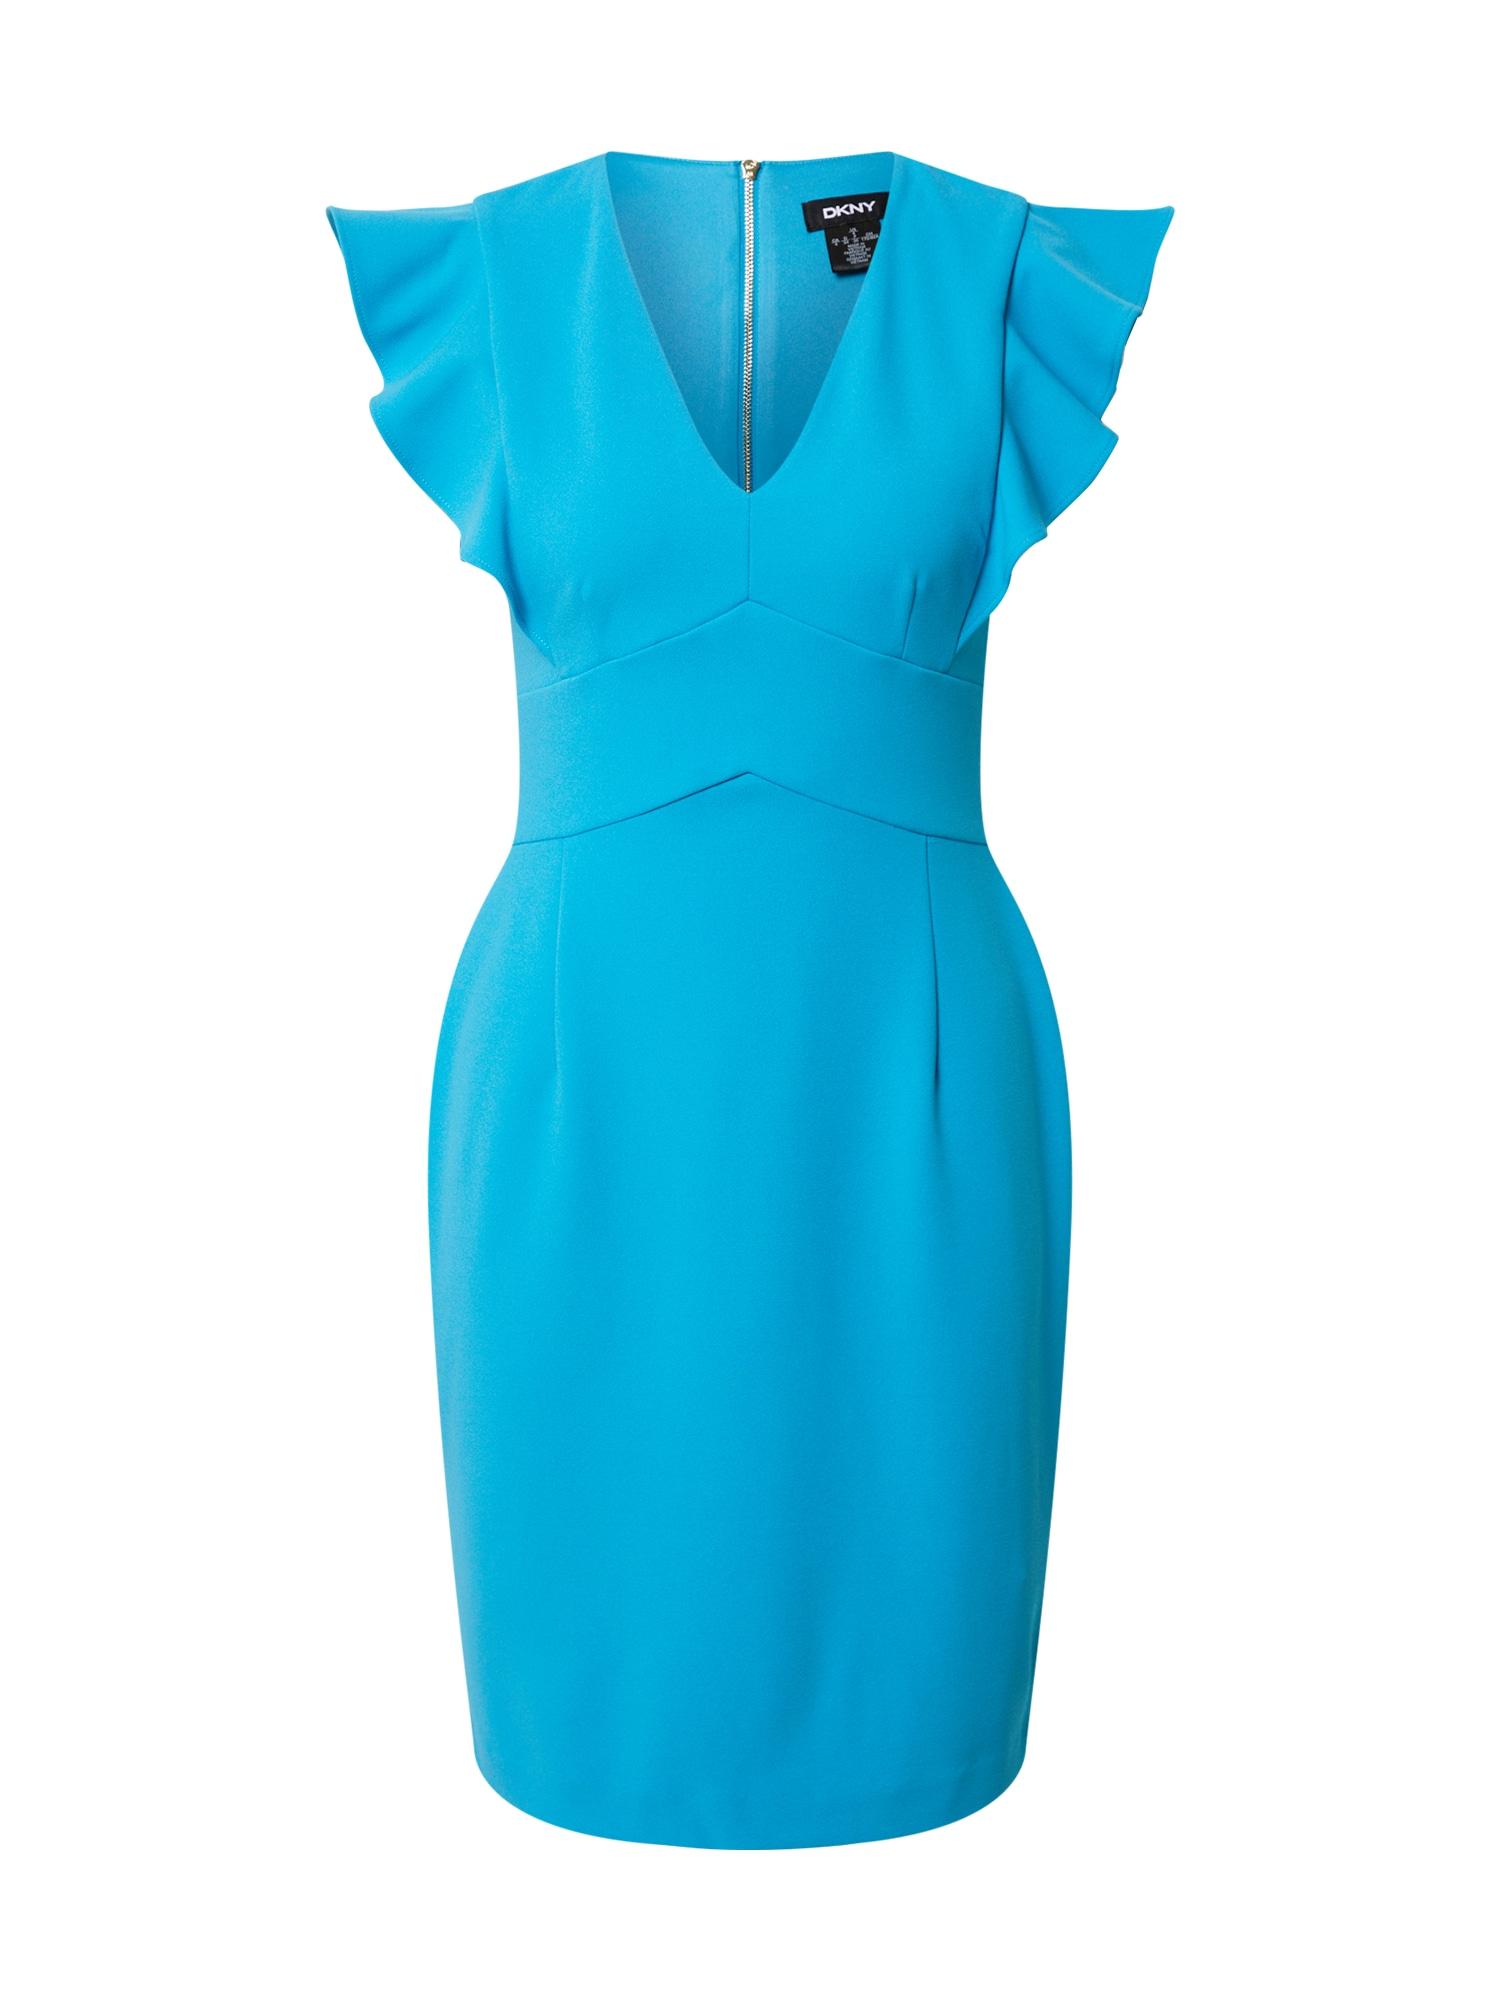 DKNY Suknelė neoninė mėlyna